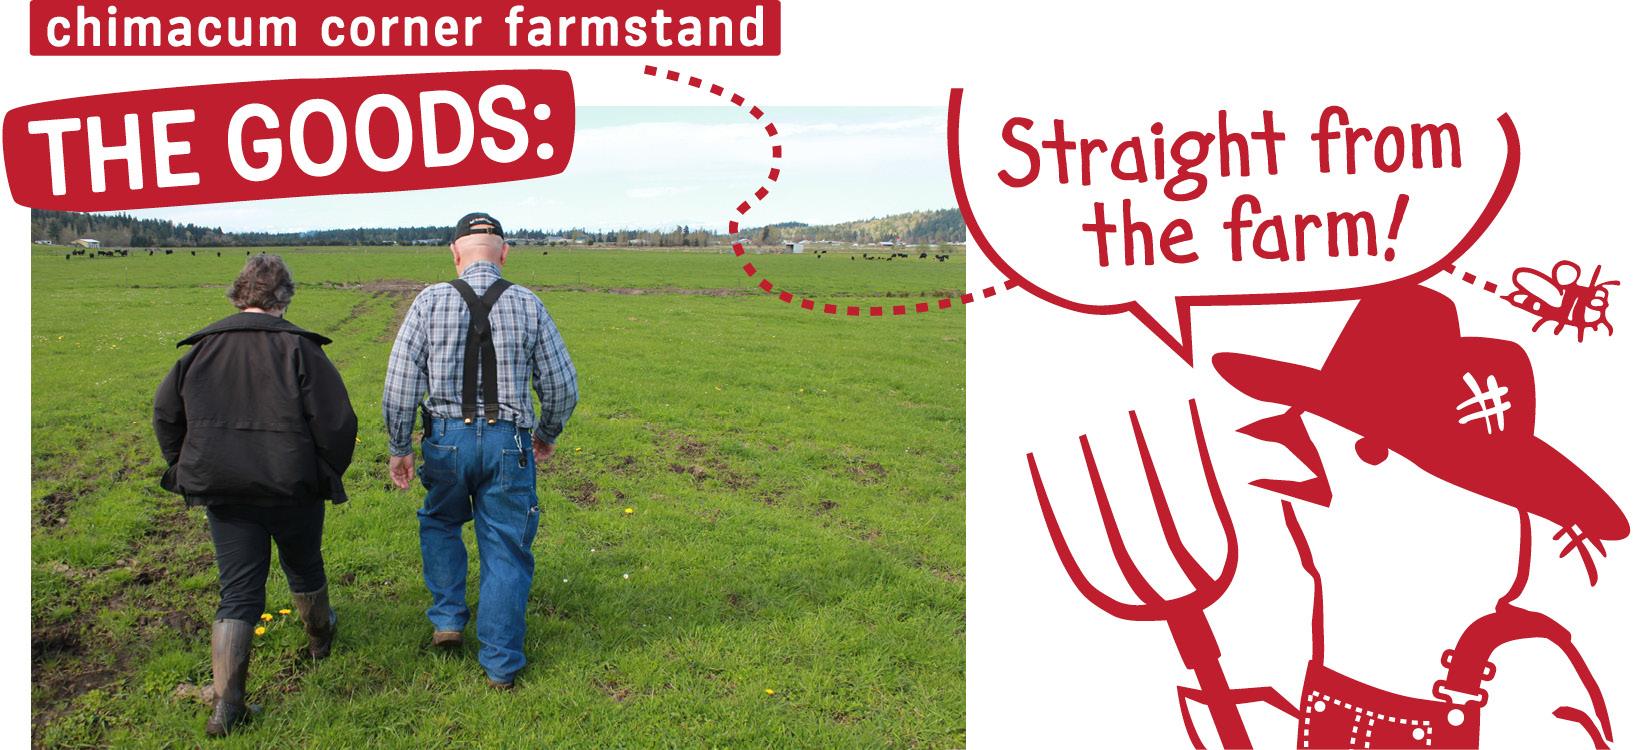 chimacum-corner-farmstand-goods-cartoon.jpg